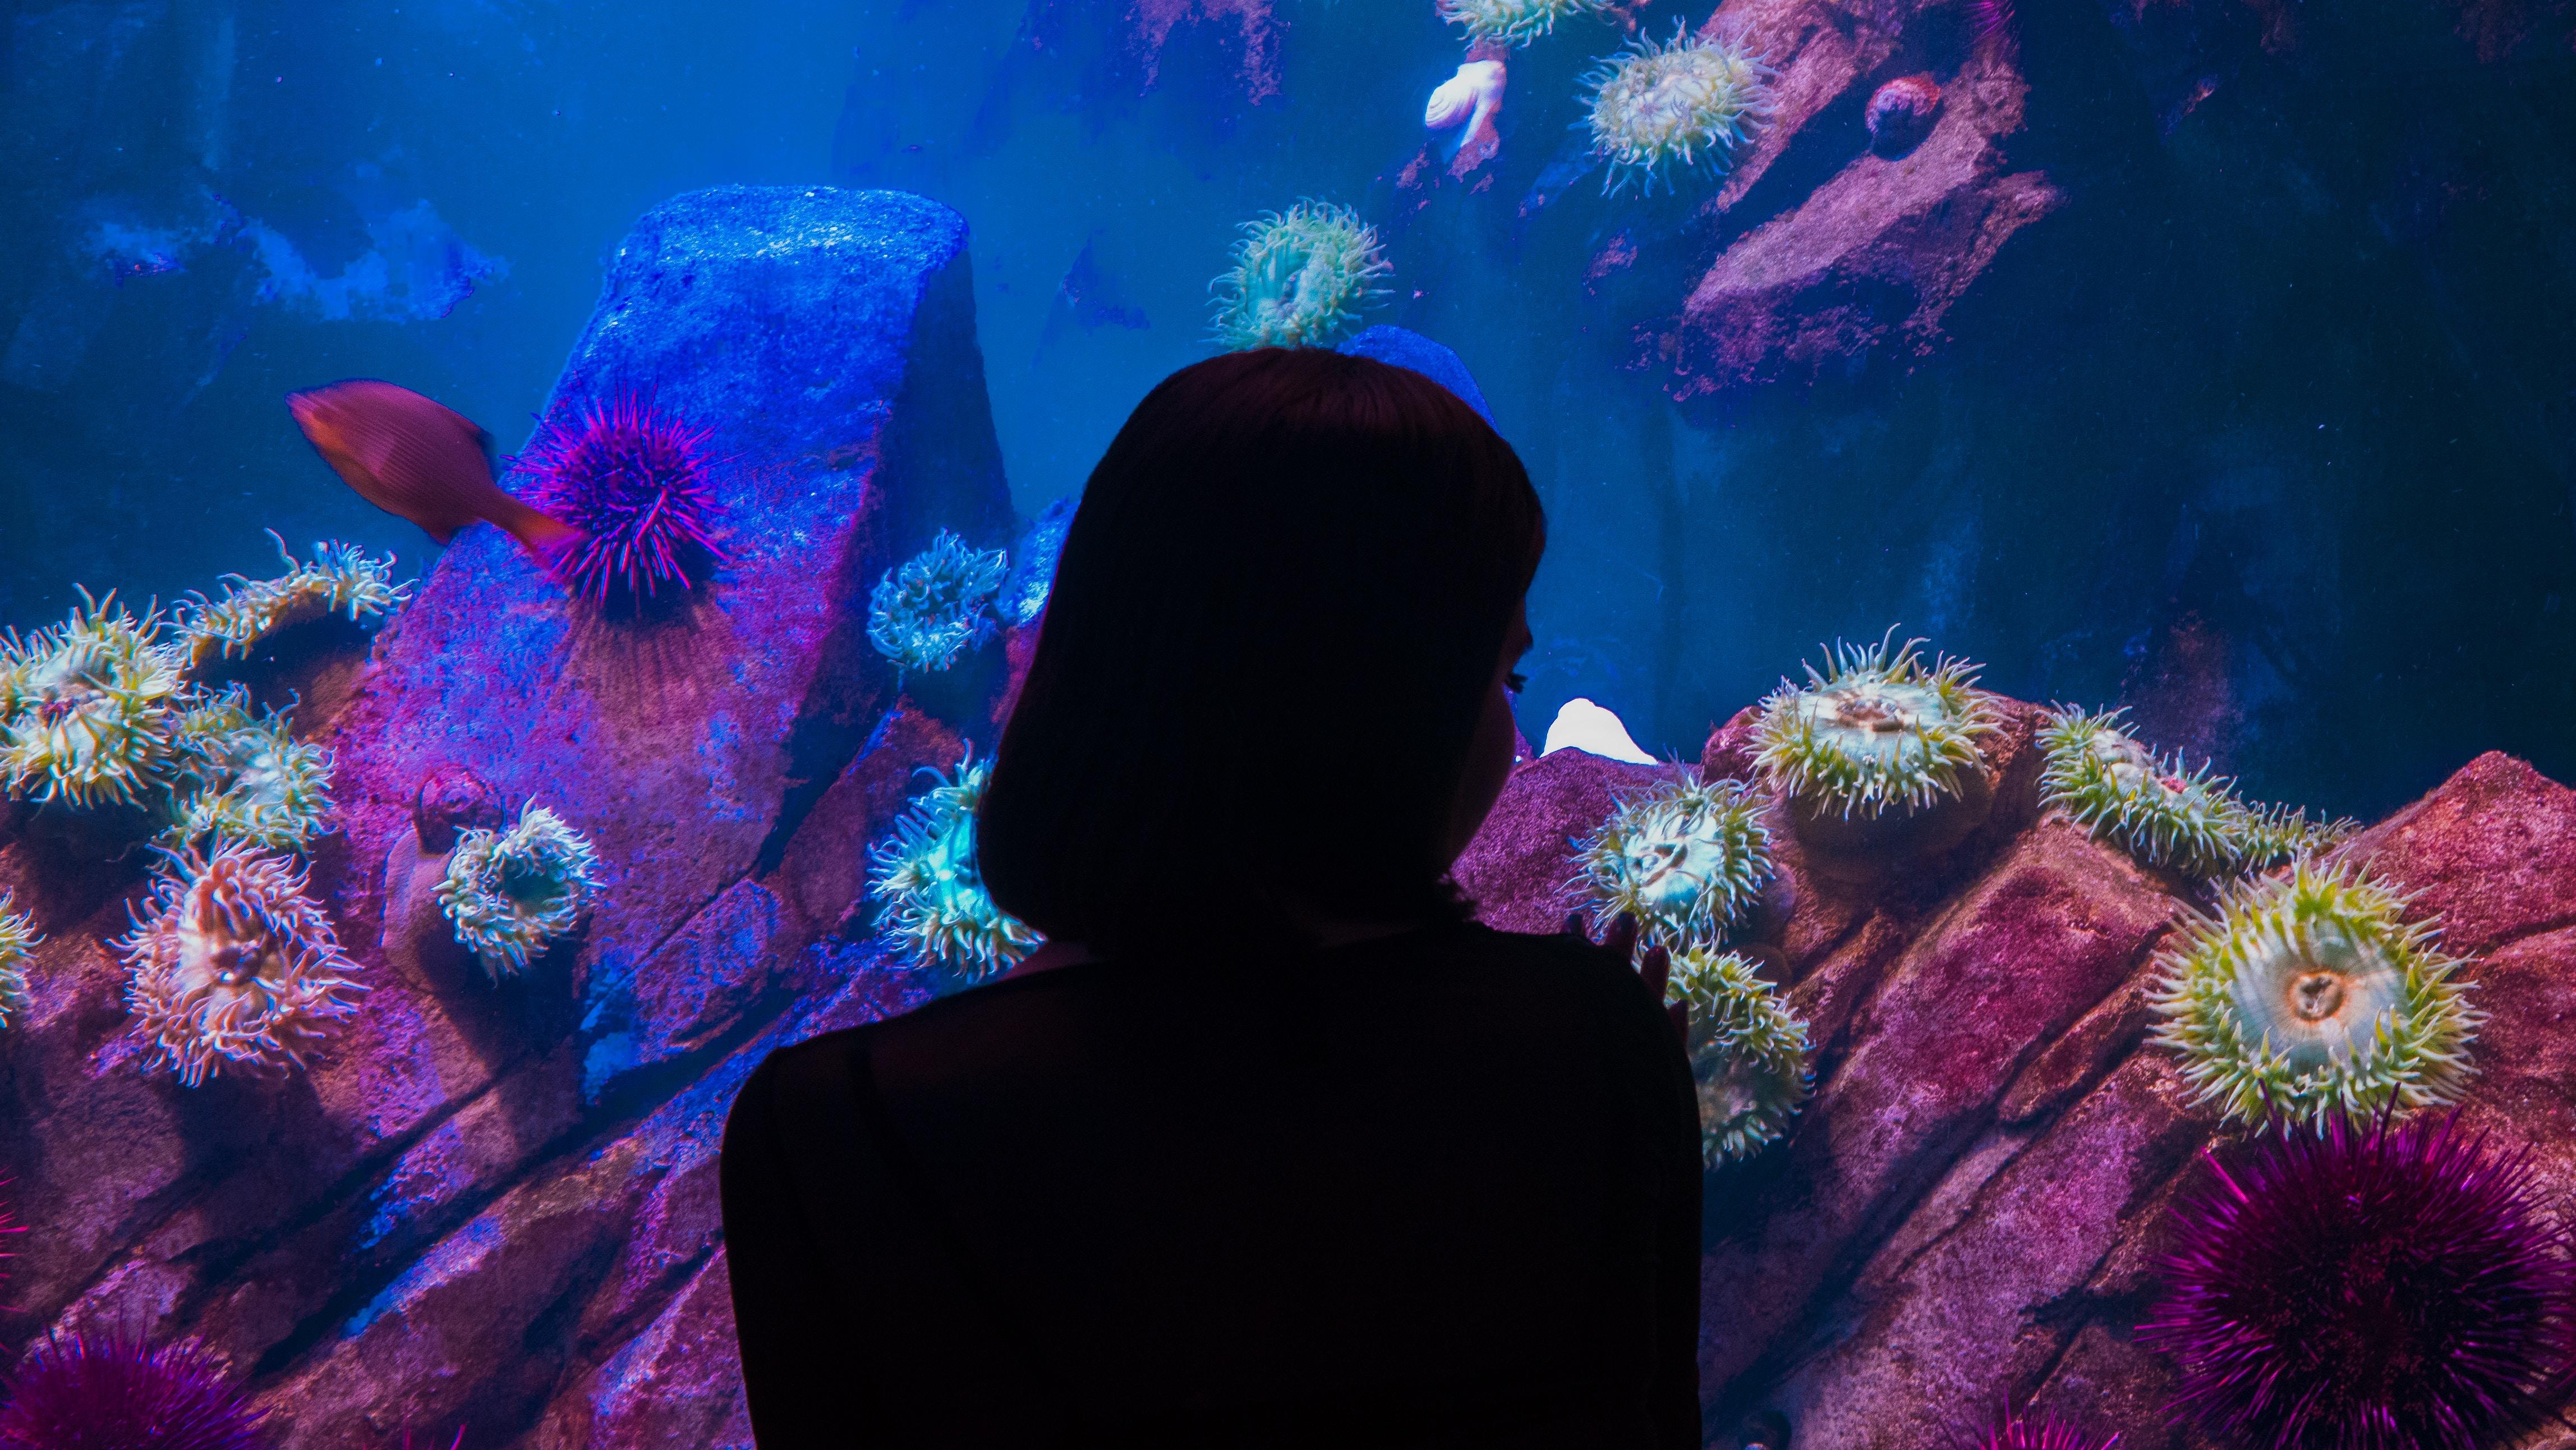 woman near aquarium shadow photography